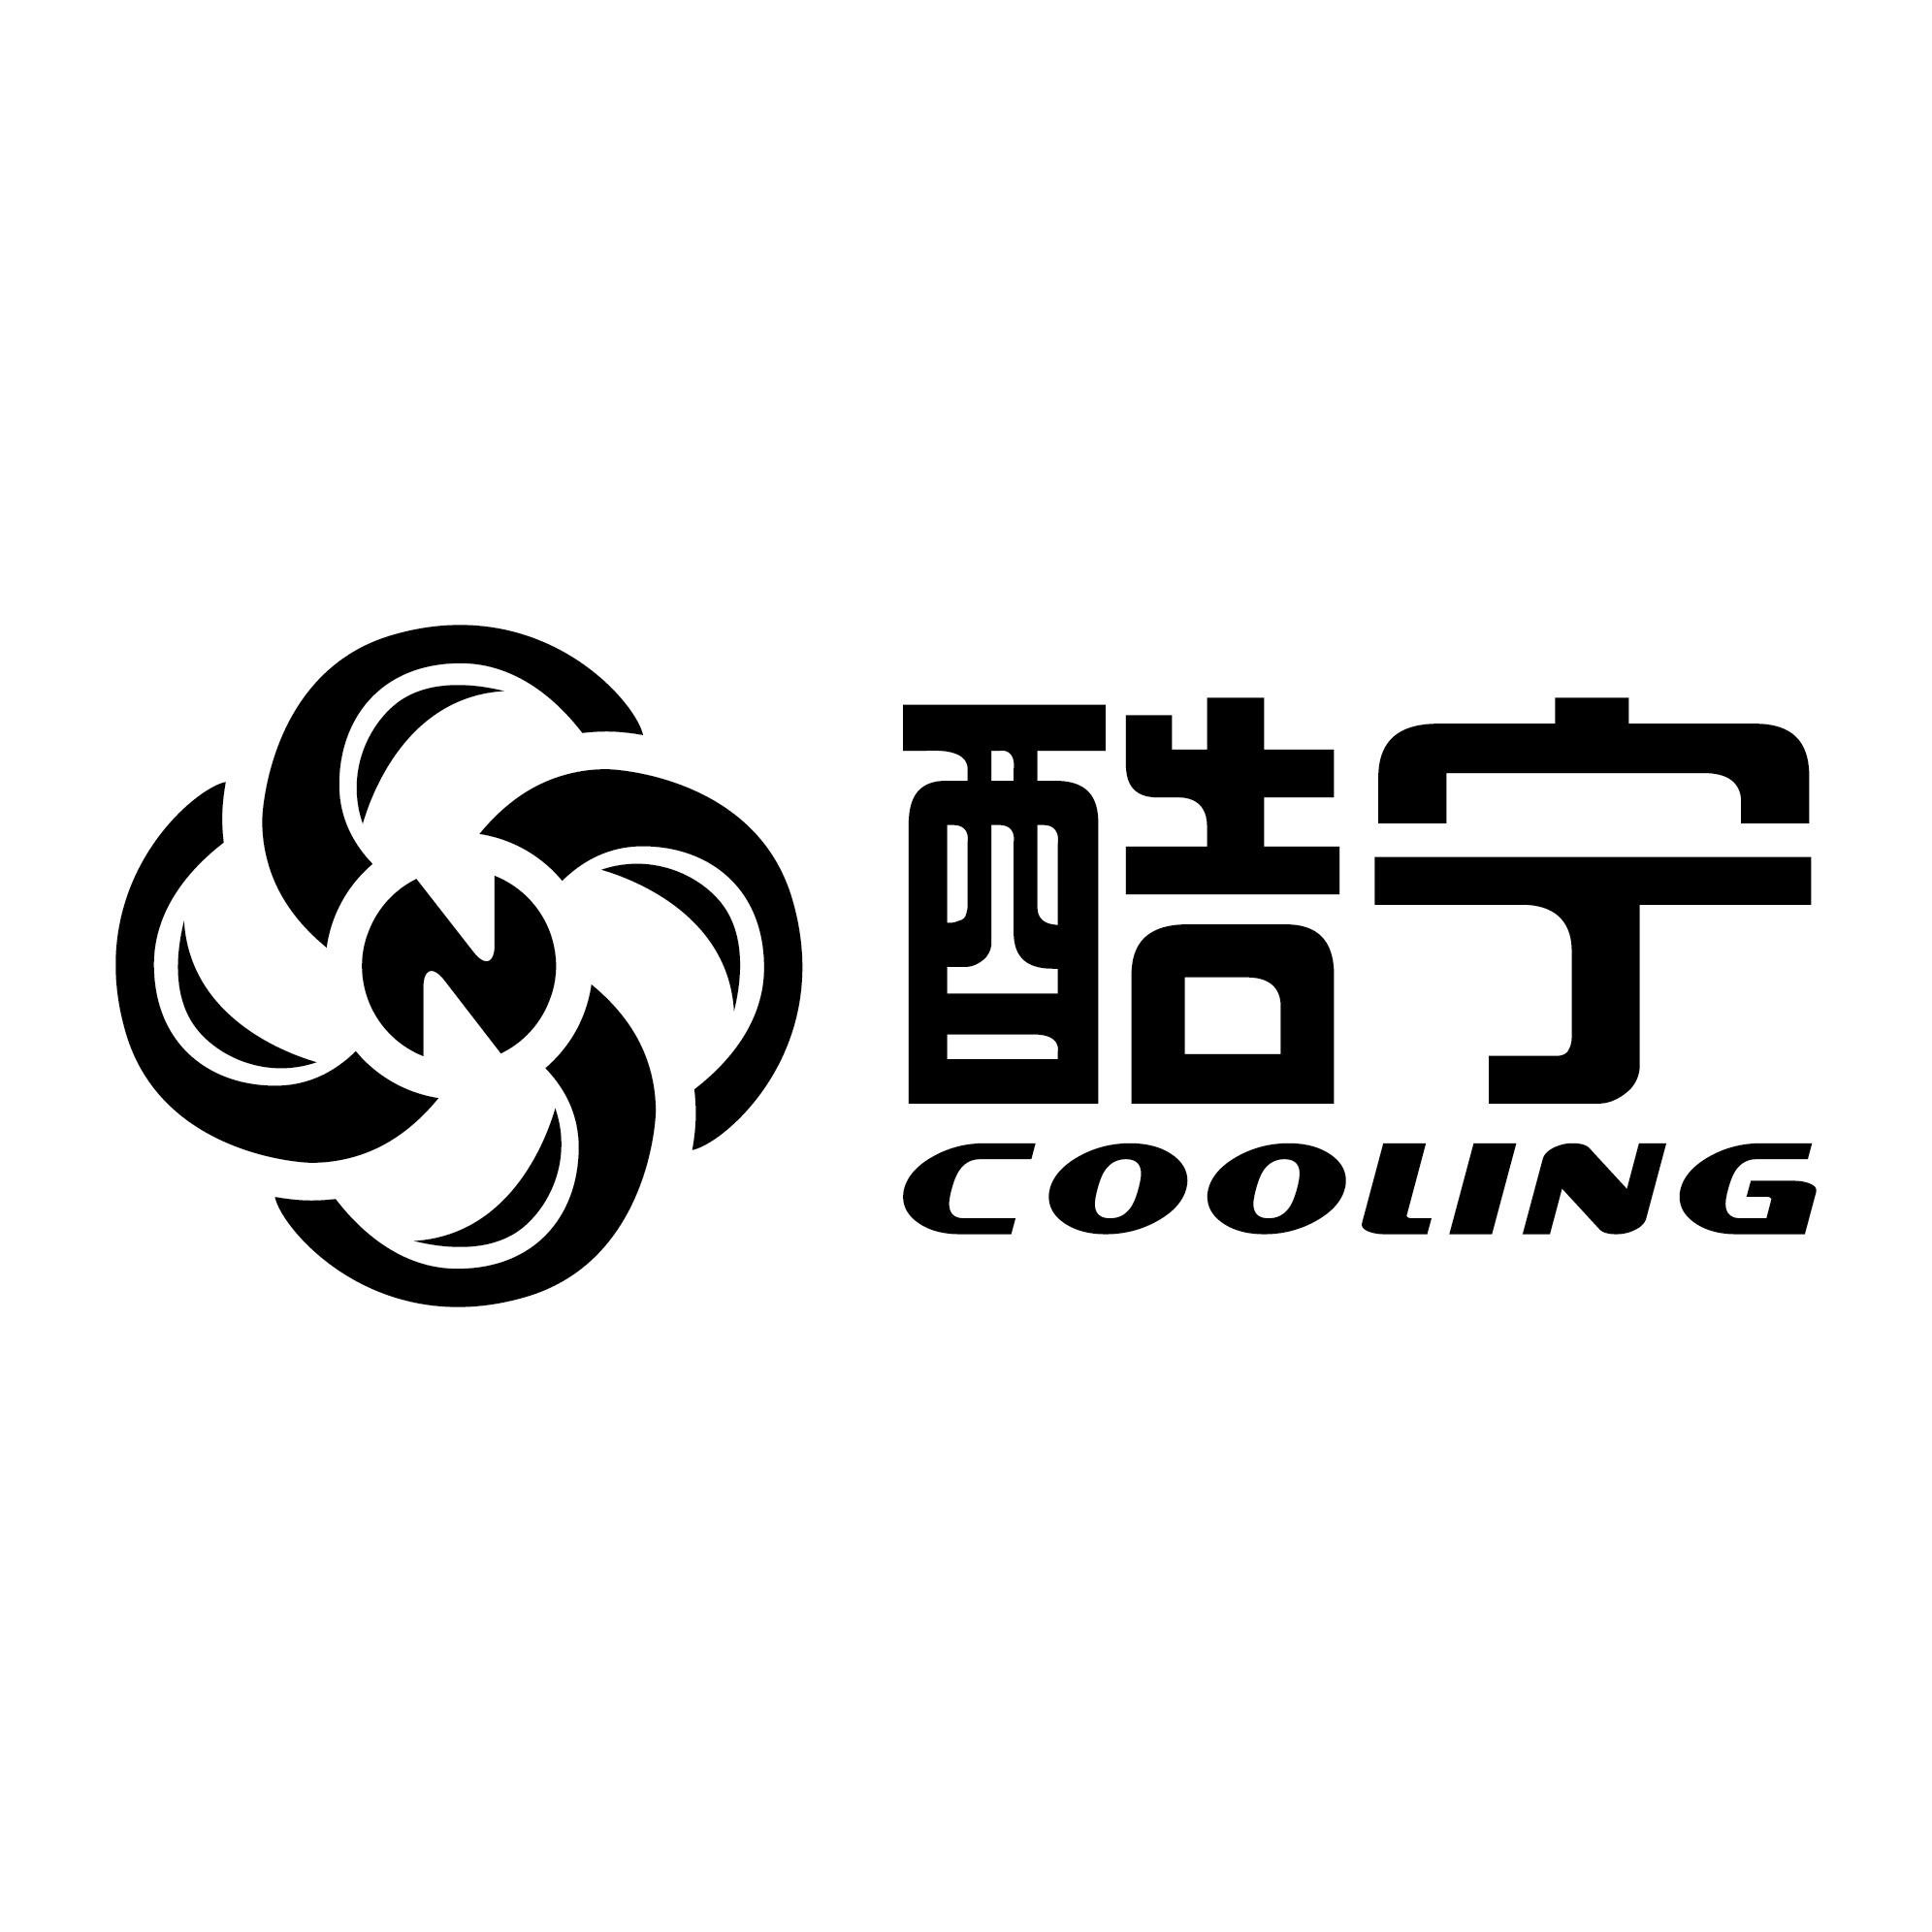 Shenzhen Cooling Technology Co Ltd